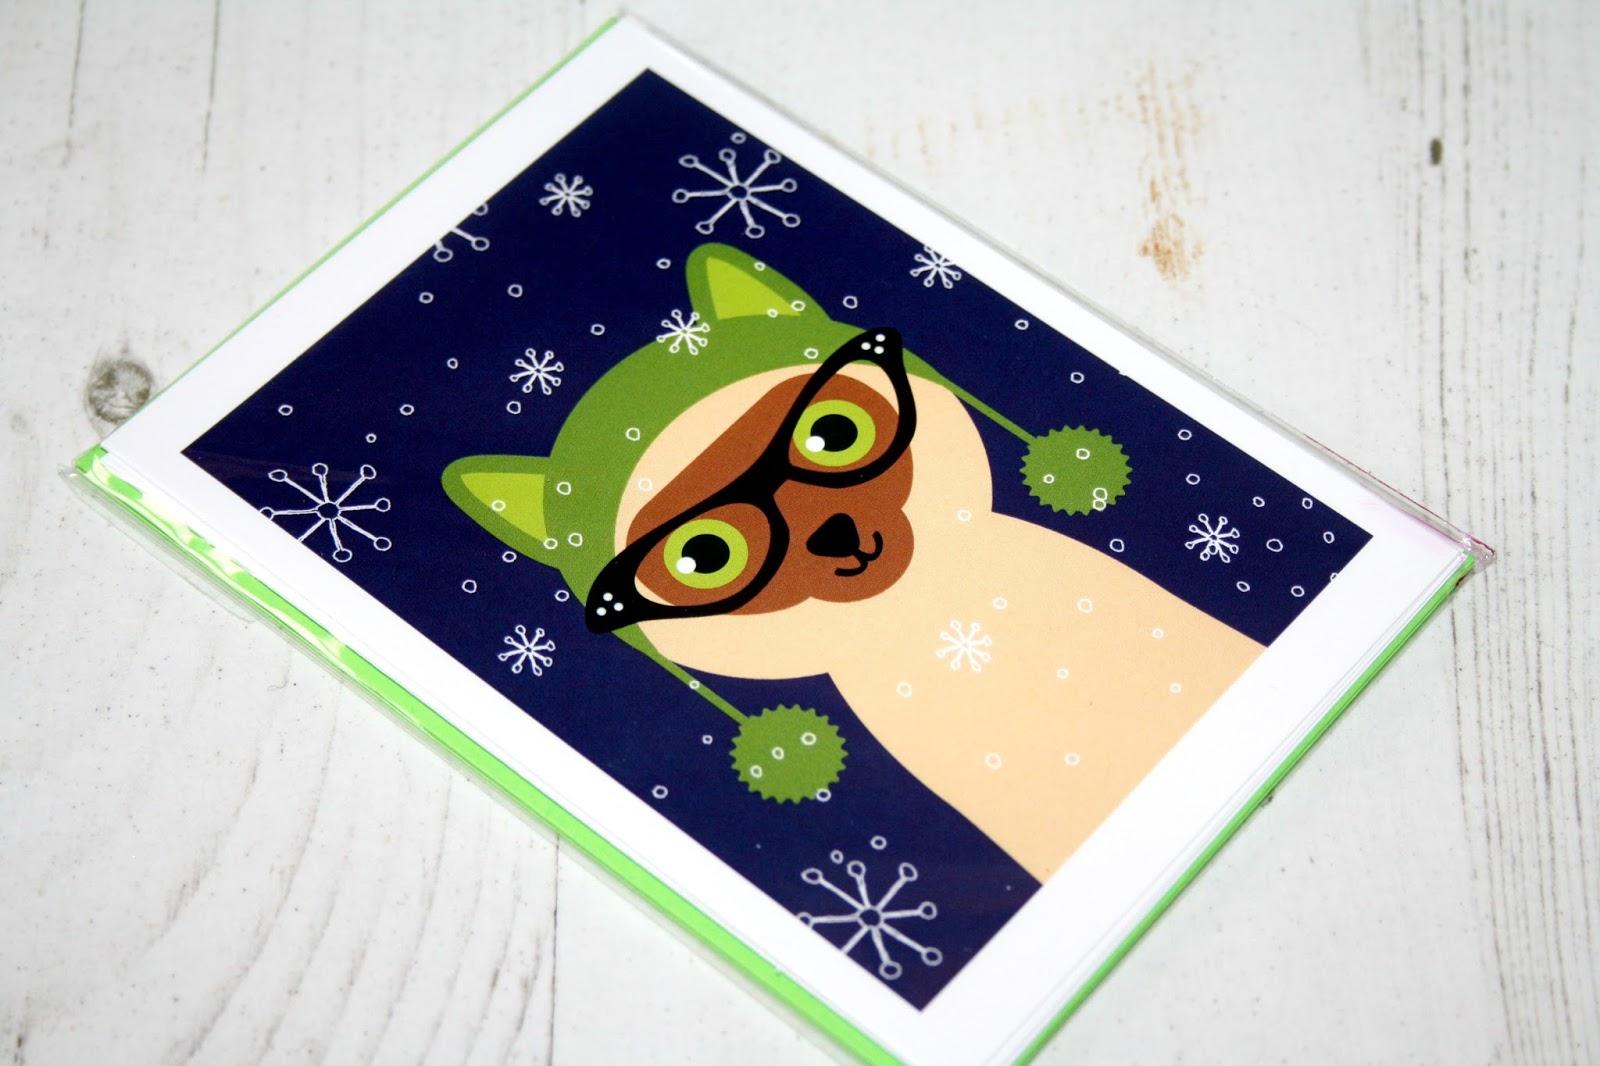 beautyqueenuk: Winter Wonderland with My Purrfect Gift Box